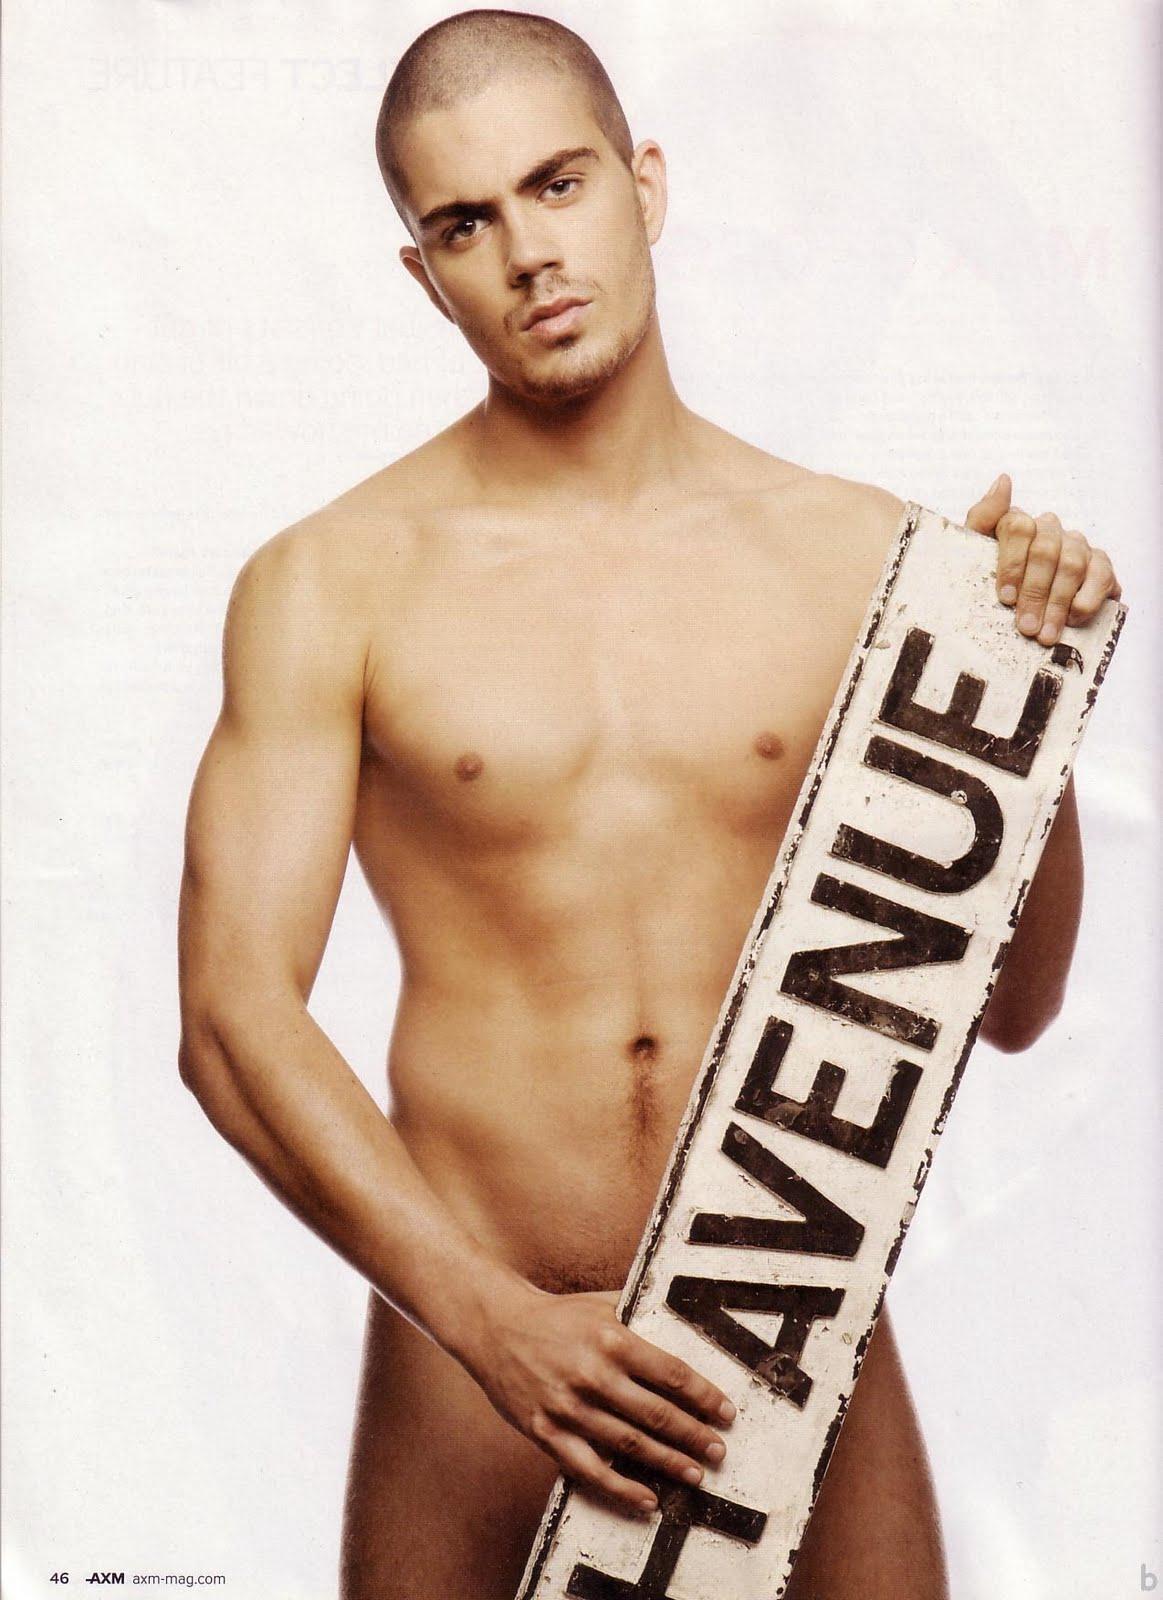 Nude Male Celebrities: Max George